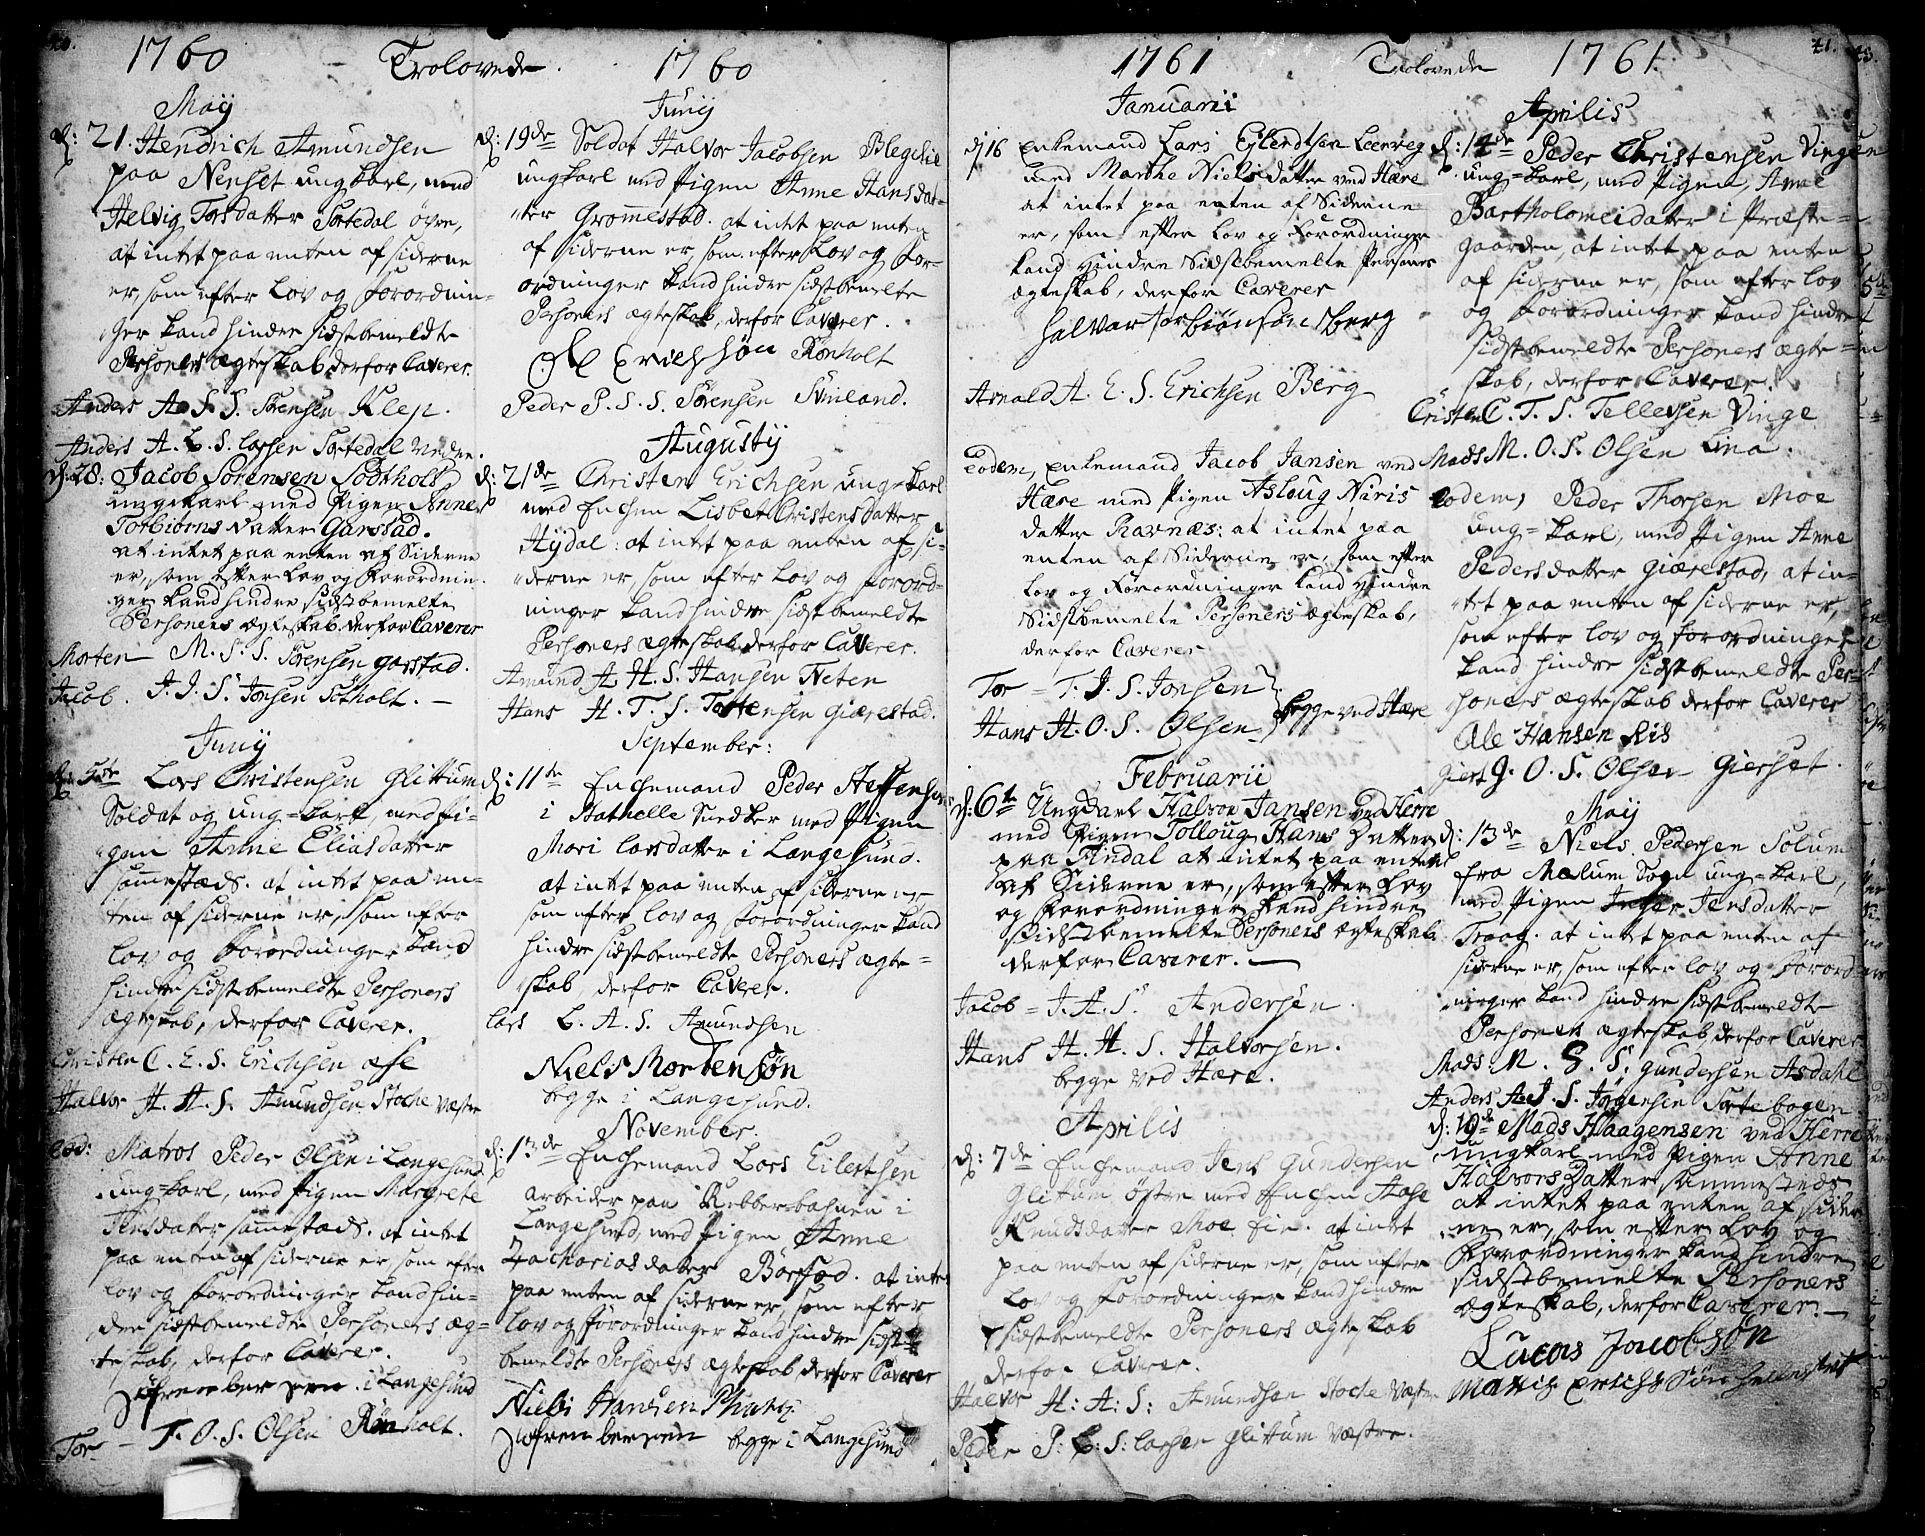 SAKO, Bamble kirkebøker, F/Fa/L0001: Ministerialbok nr. I 1, 1702-1774, s. 40-41